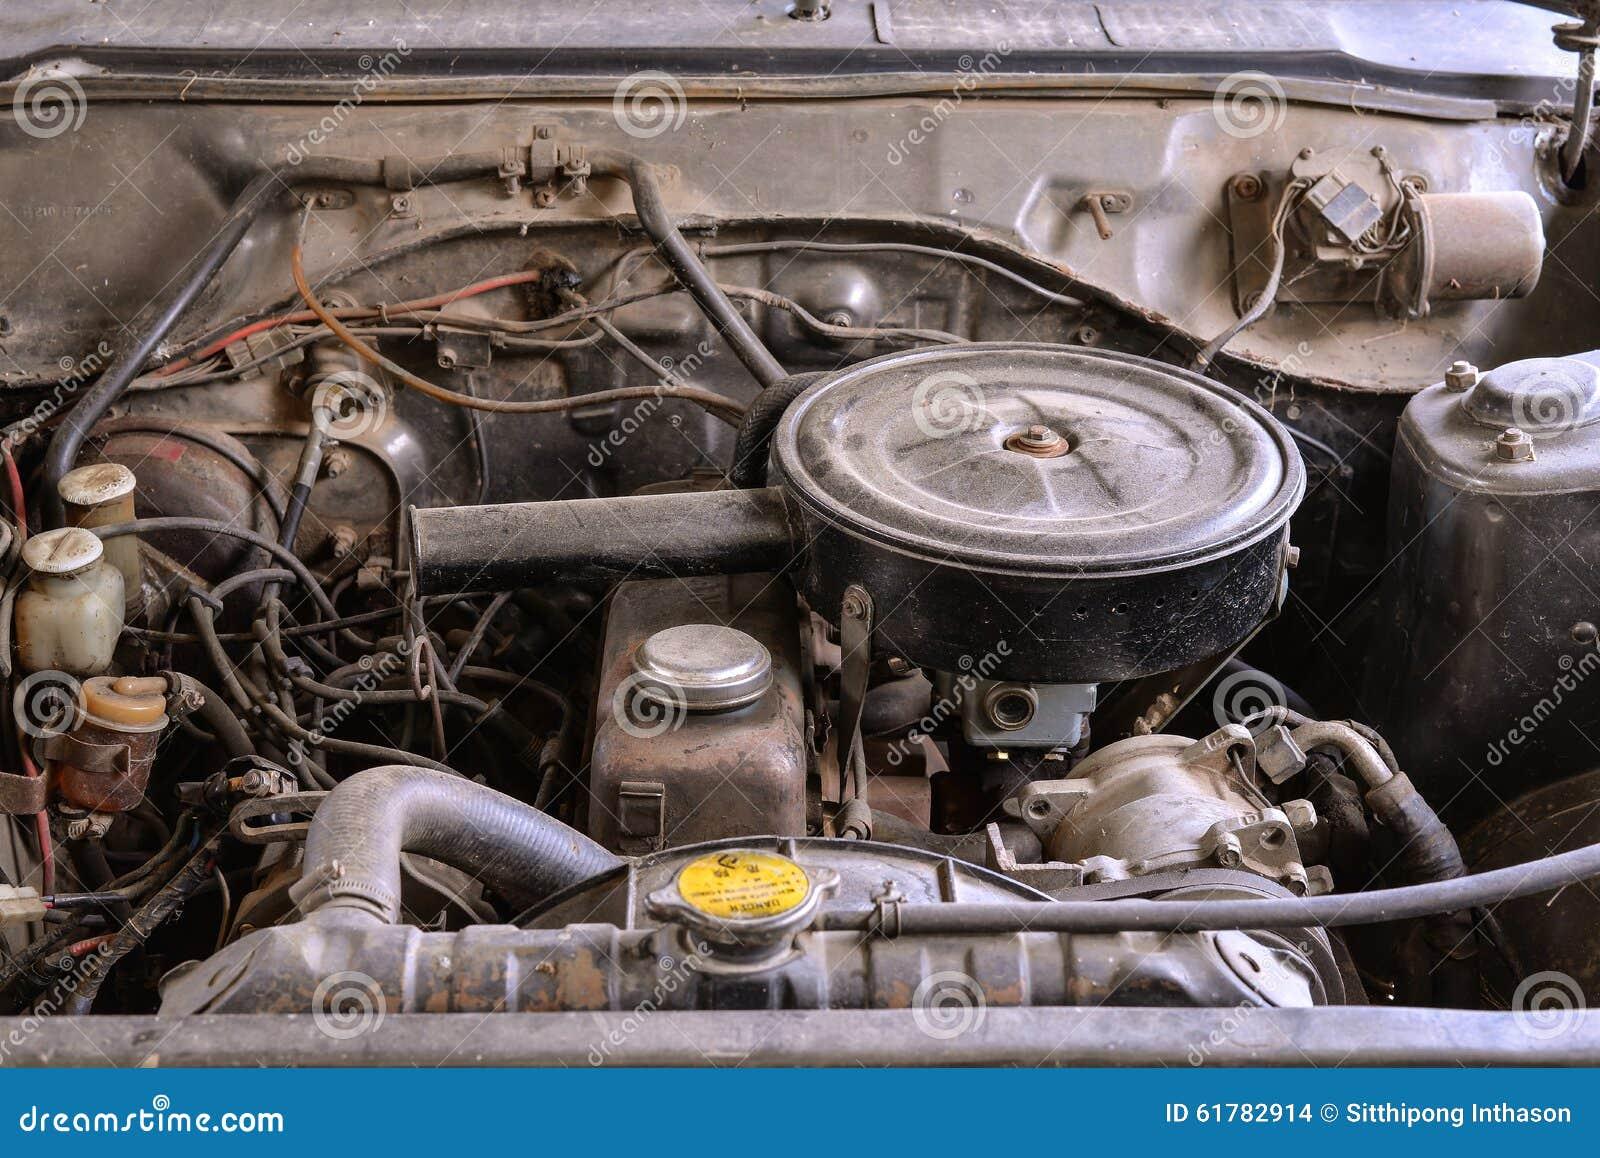 Engine Repair The Old Car Stock Photo | CartoonDealer.com #30042456